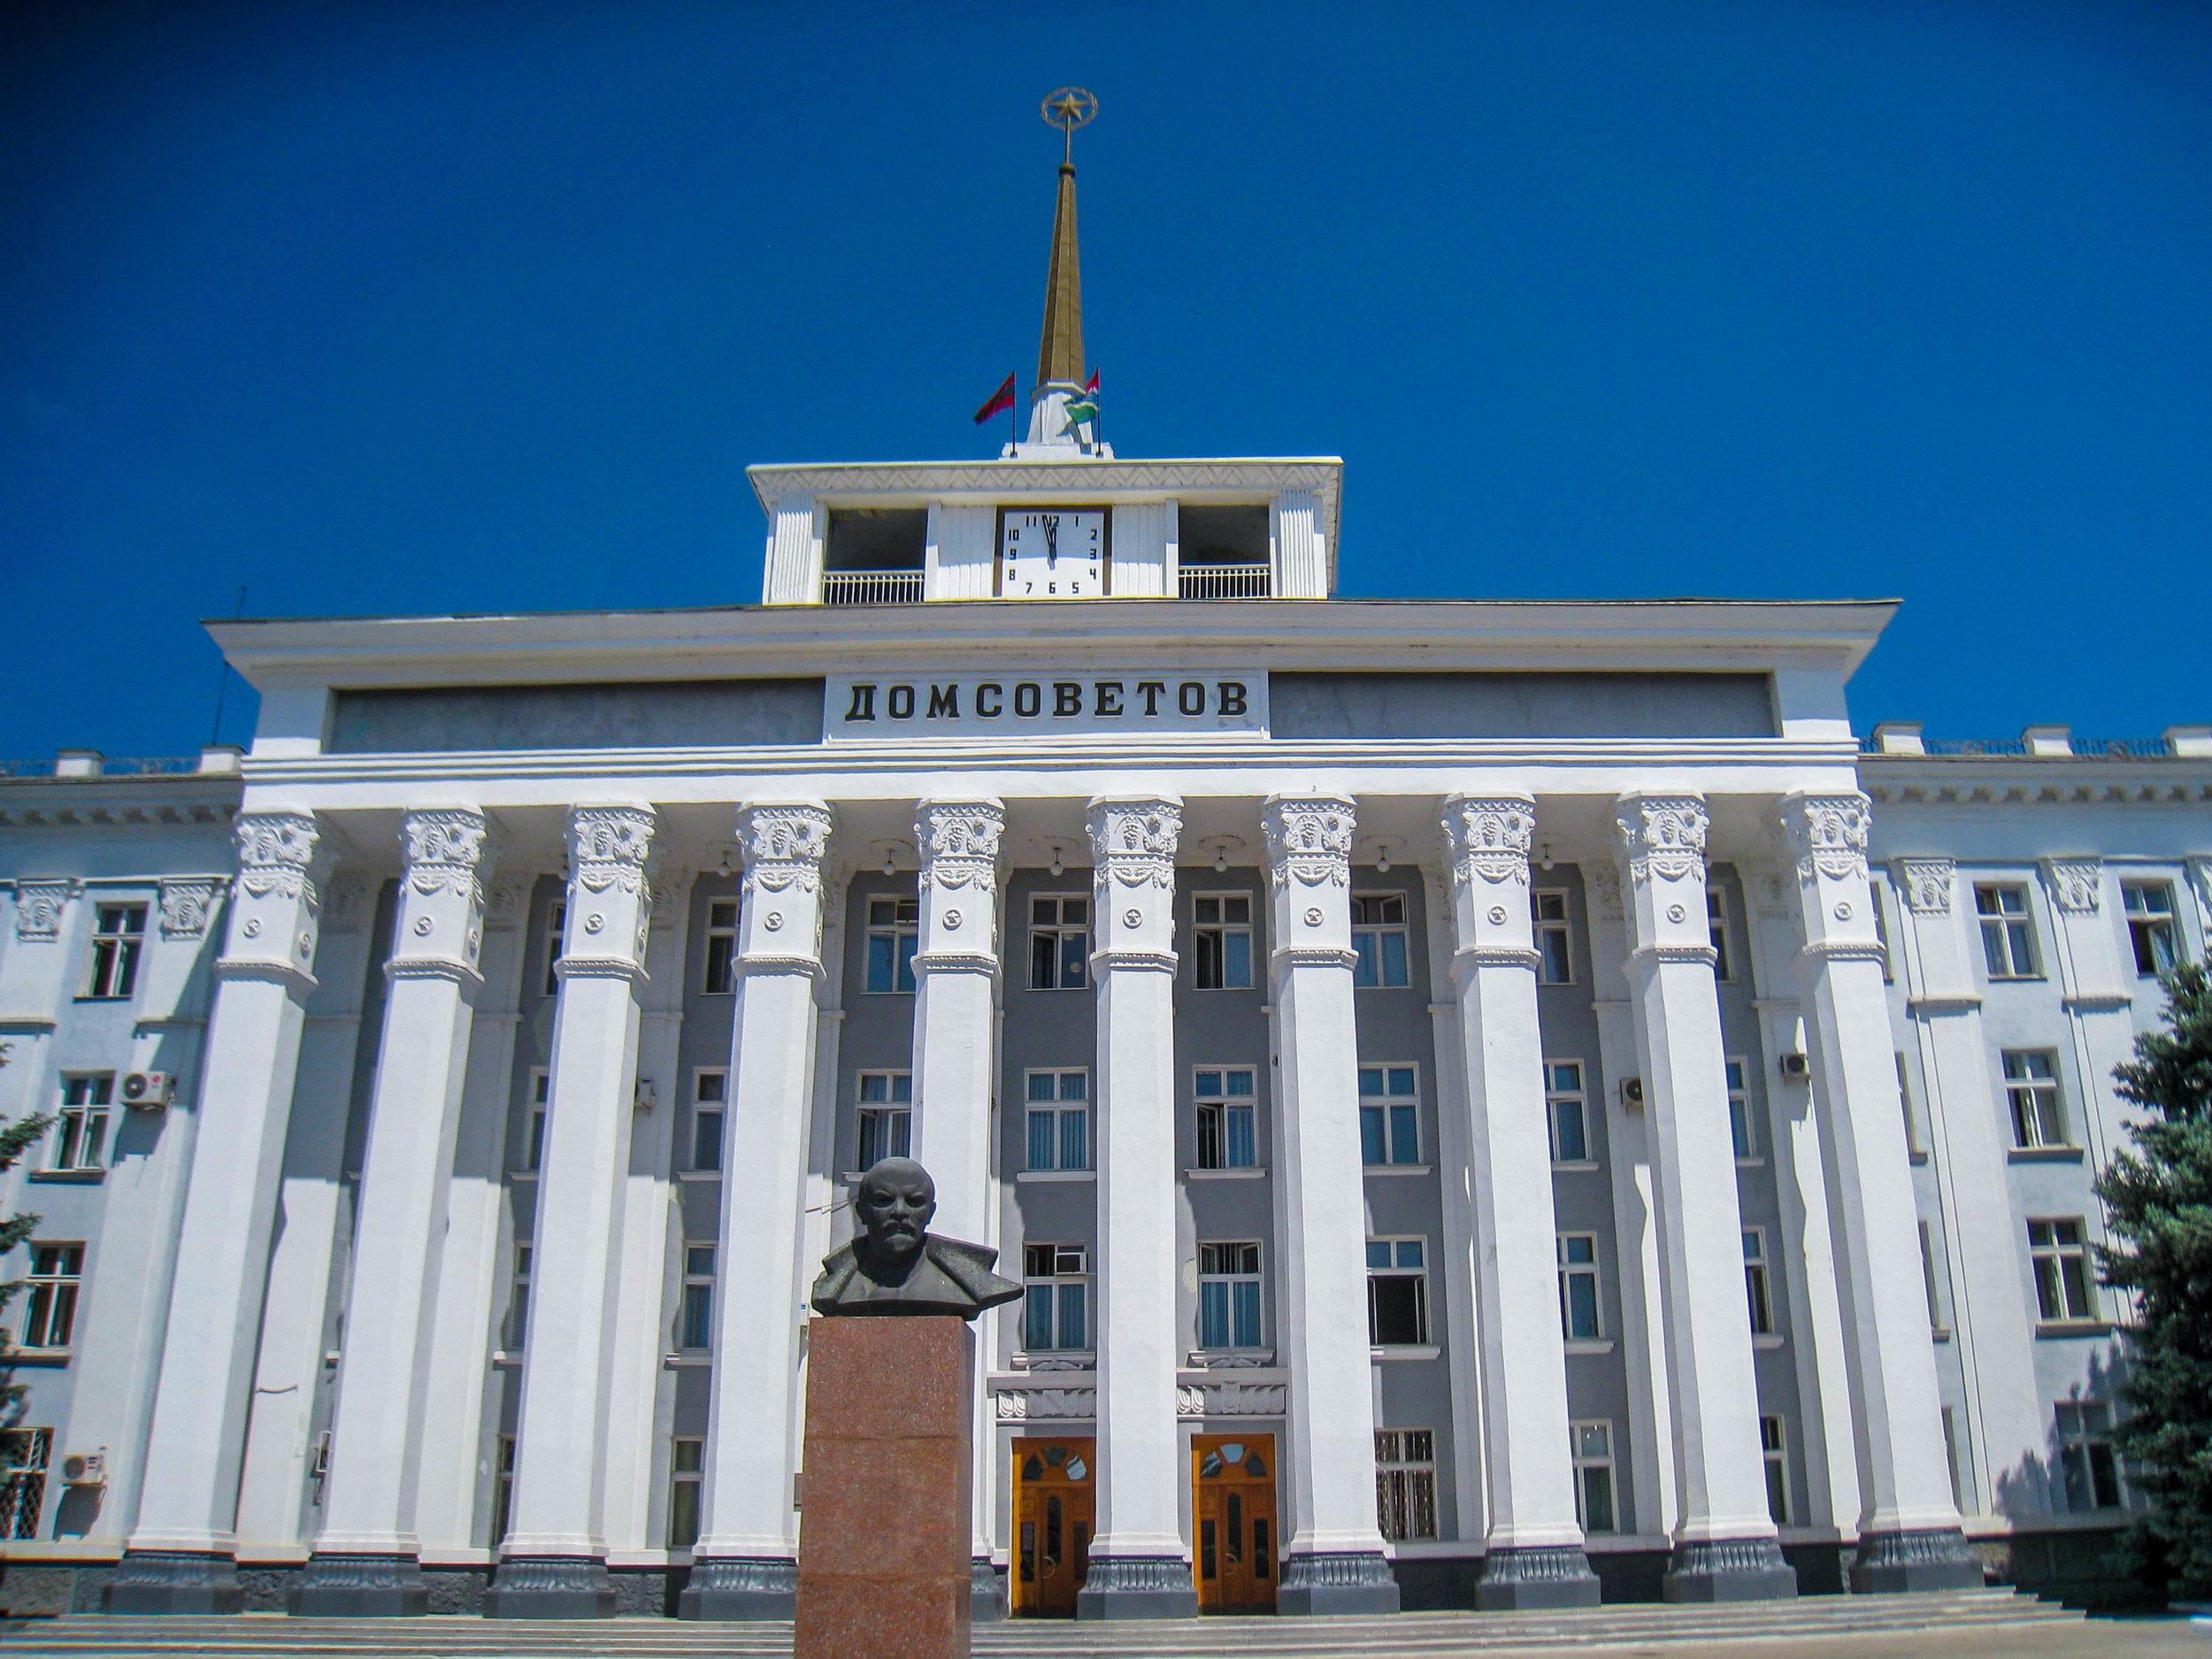 Tiraspol House of the Soviets